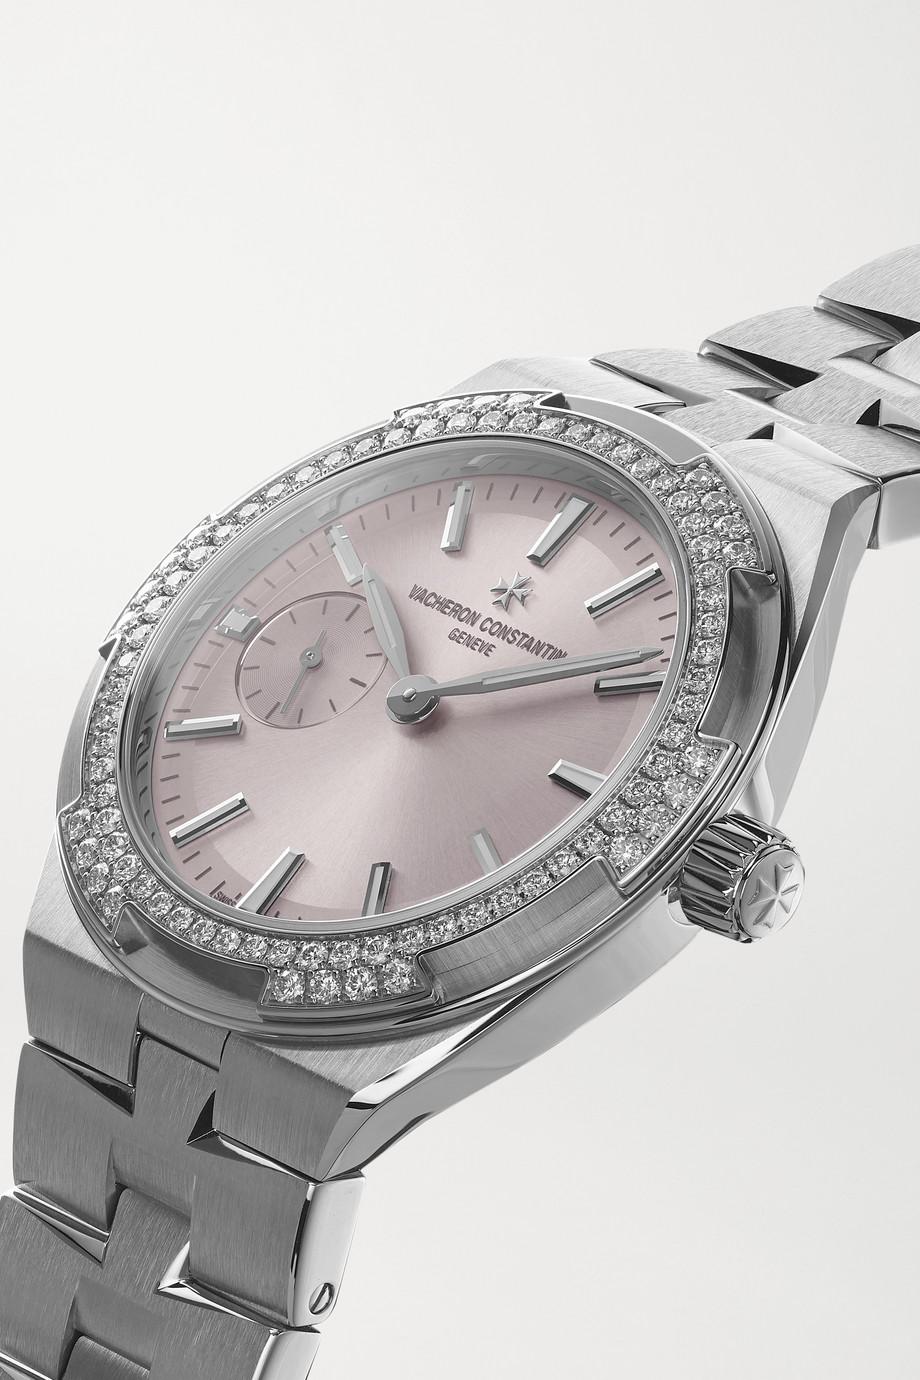 Vacheron Constantin Overseas Automatic 37mm stainless steel and diamond watch